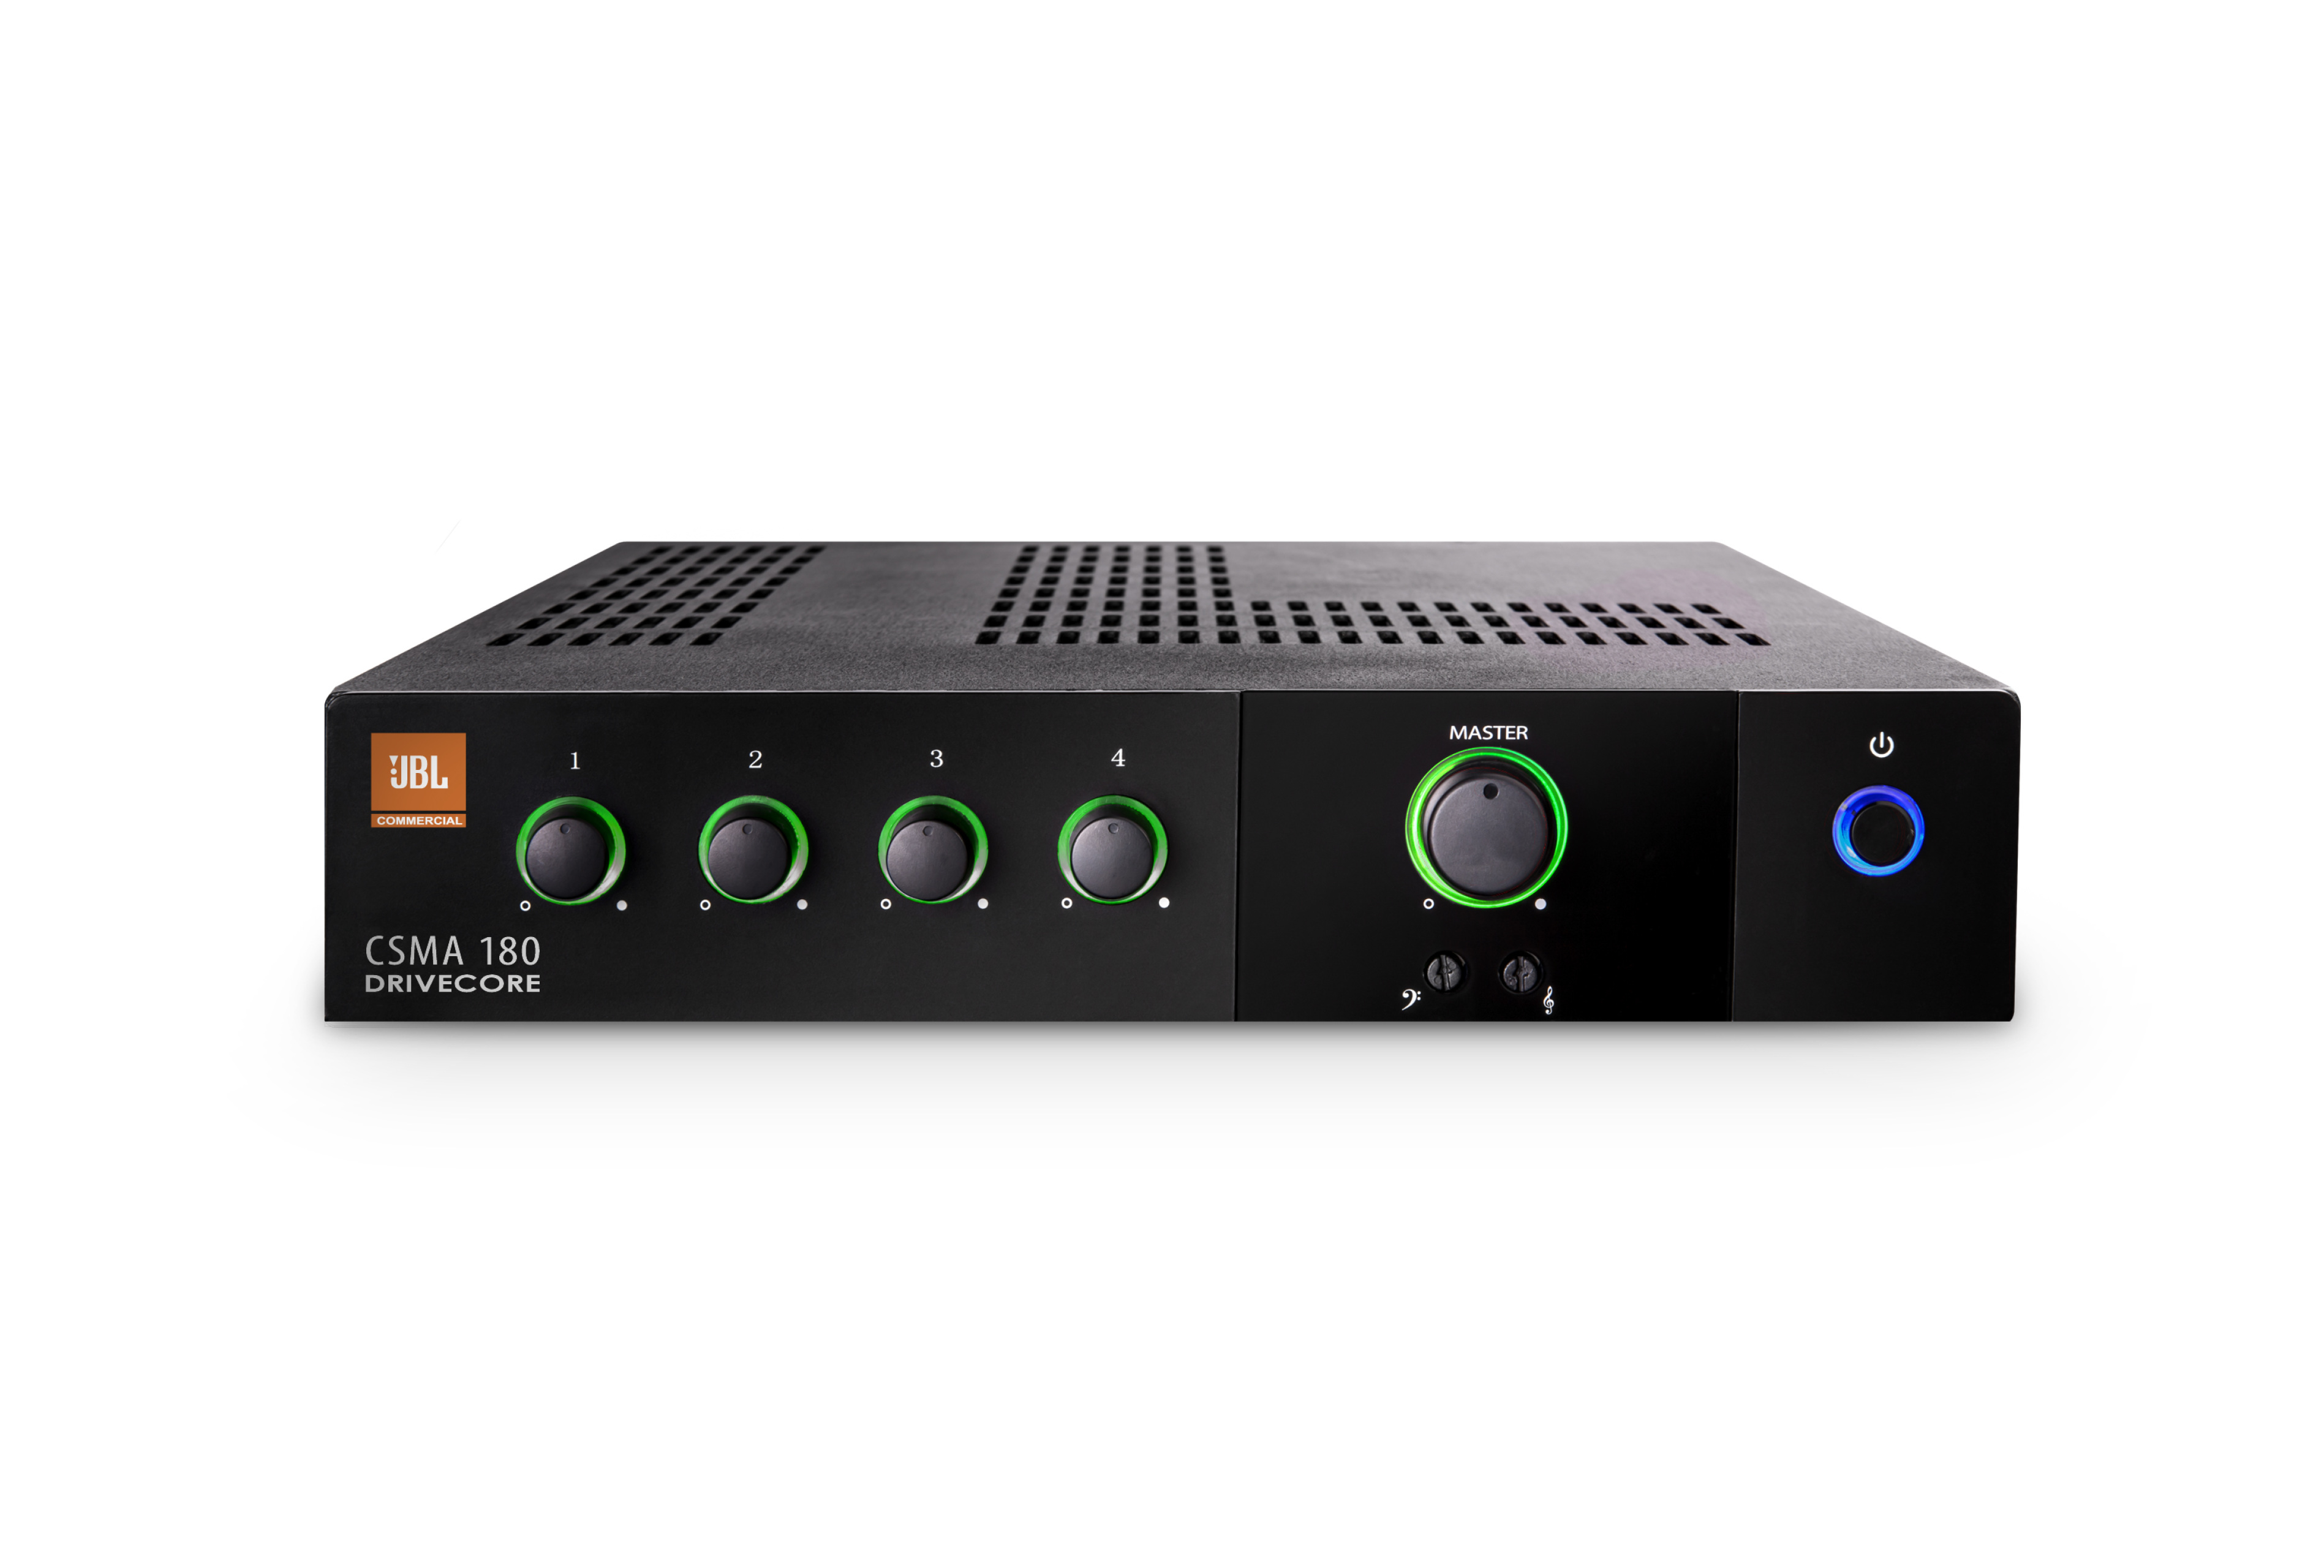 JBL CSMA-180 80-Watt 4x1 Mixer/Amplifier